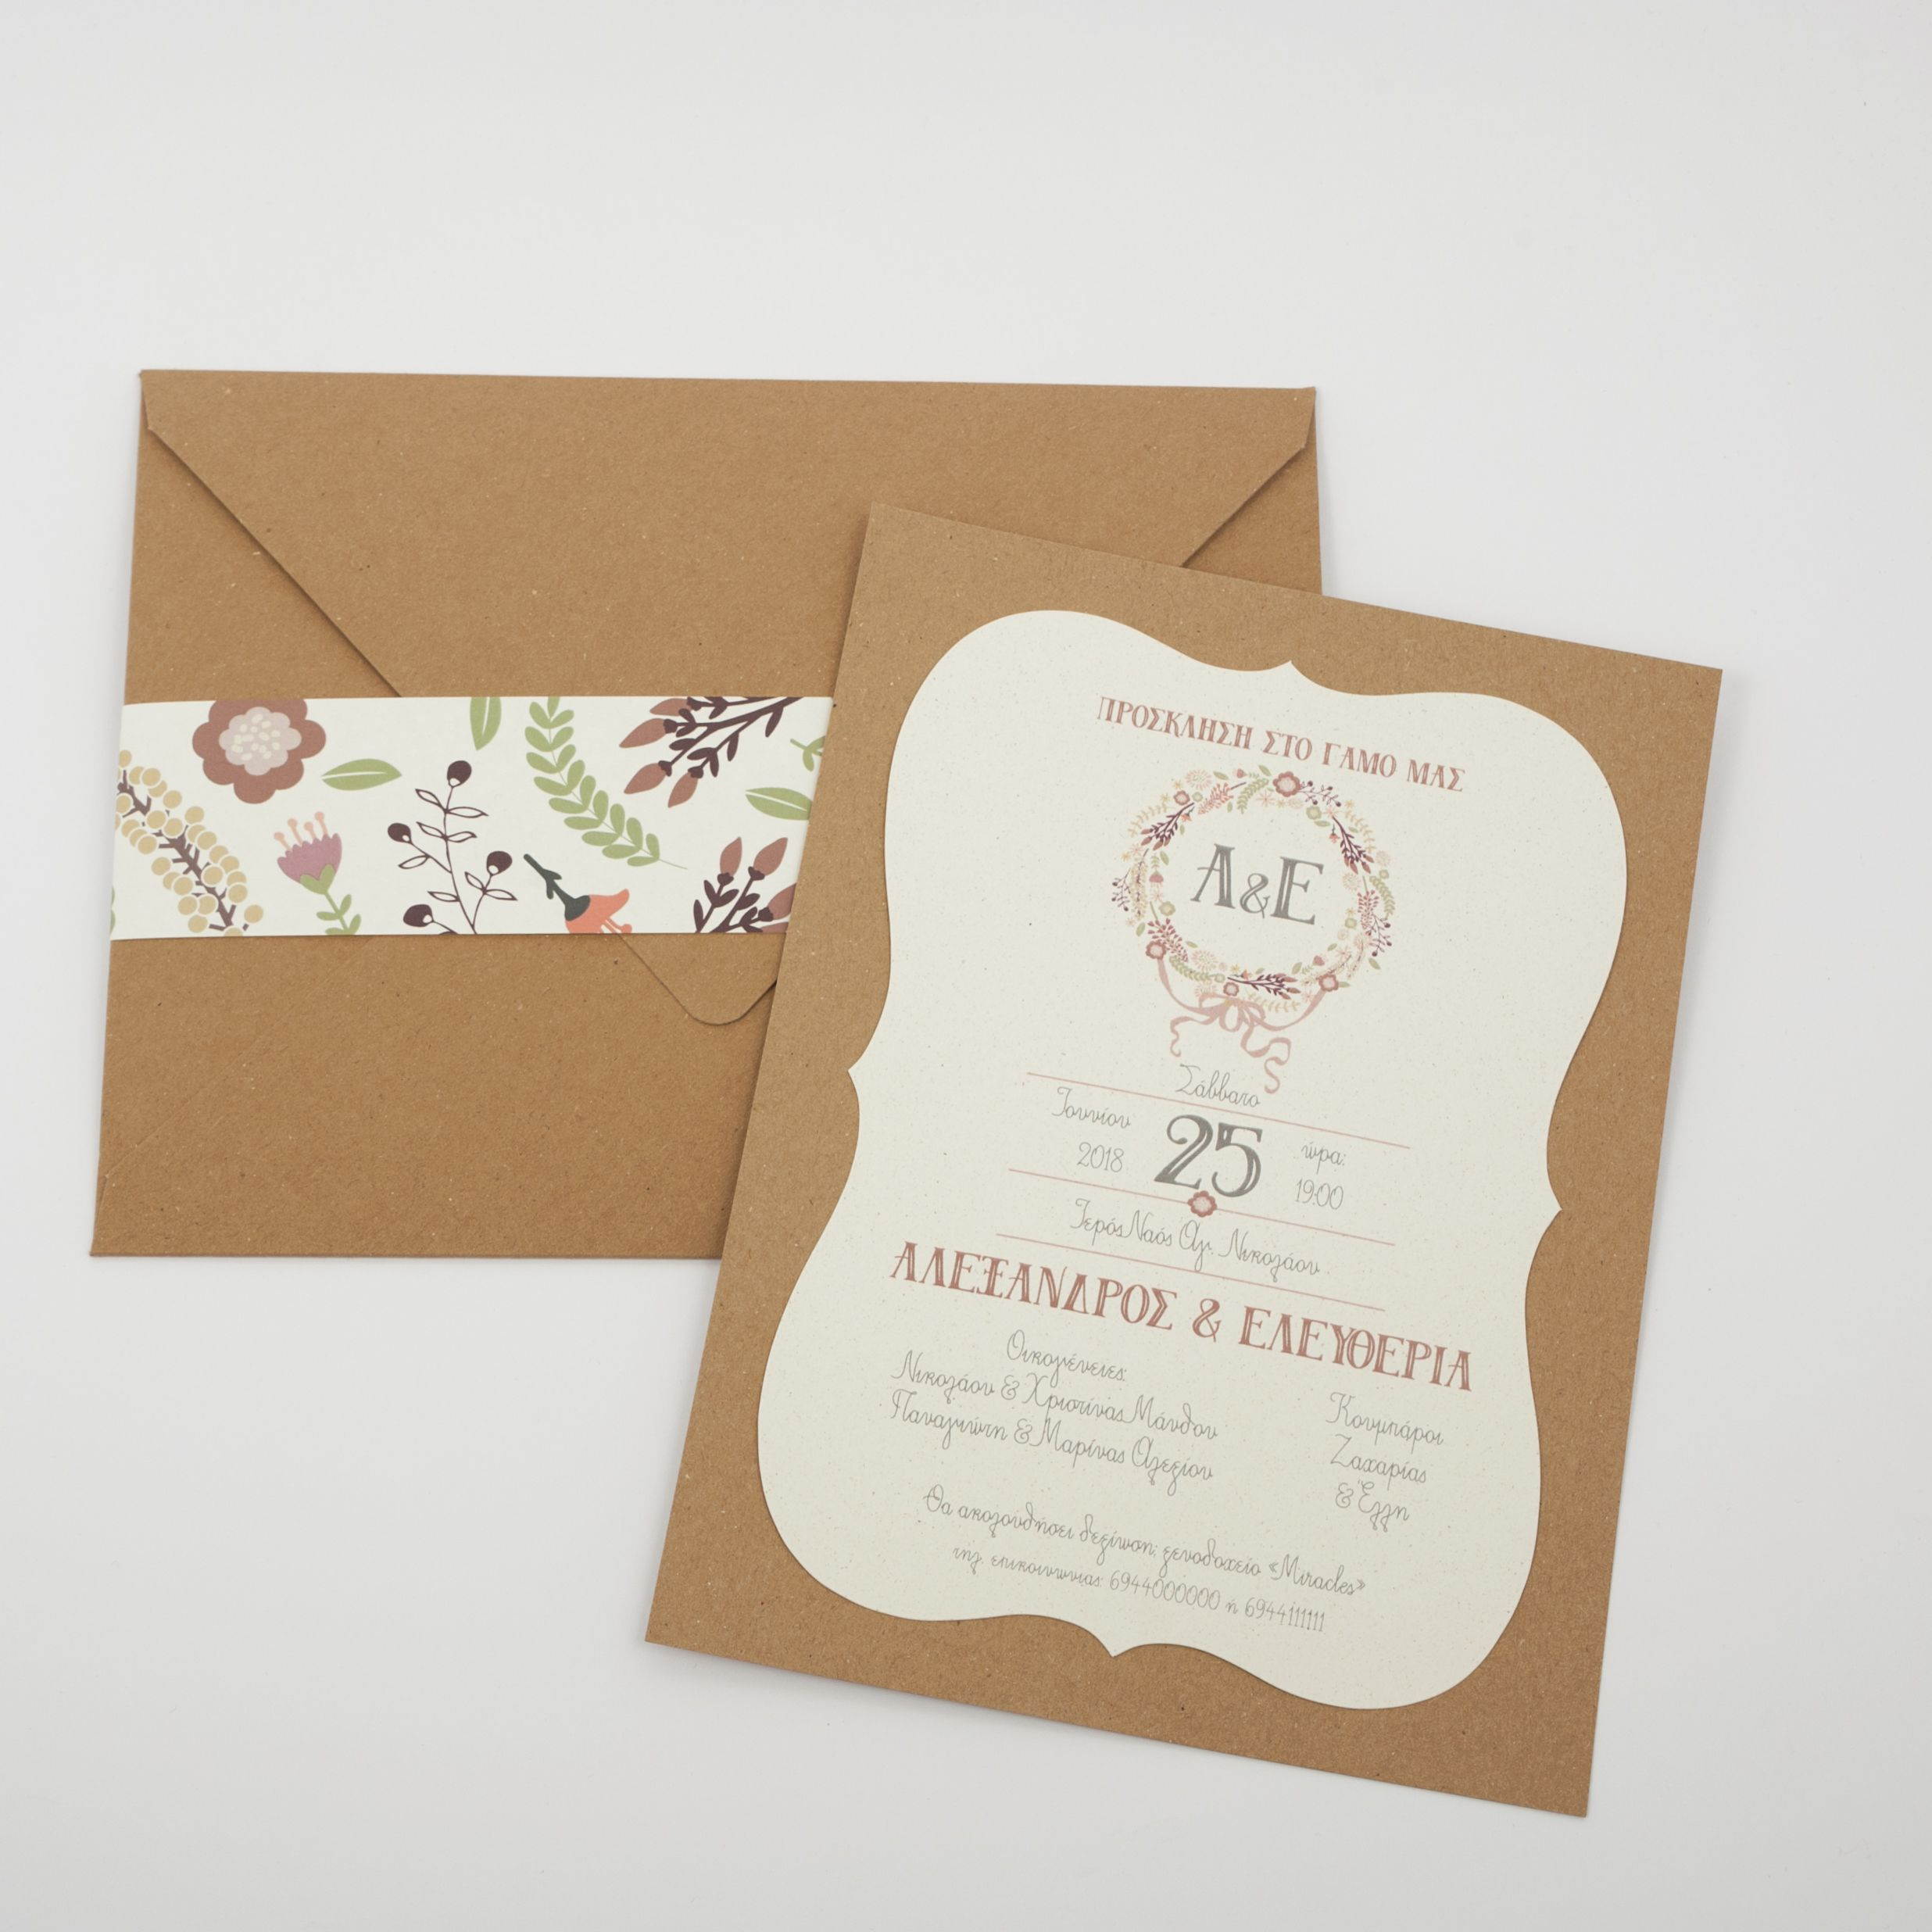 Chic and Stylish Wedding Invitations #boho #style #theme #floral ...